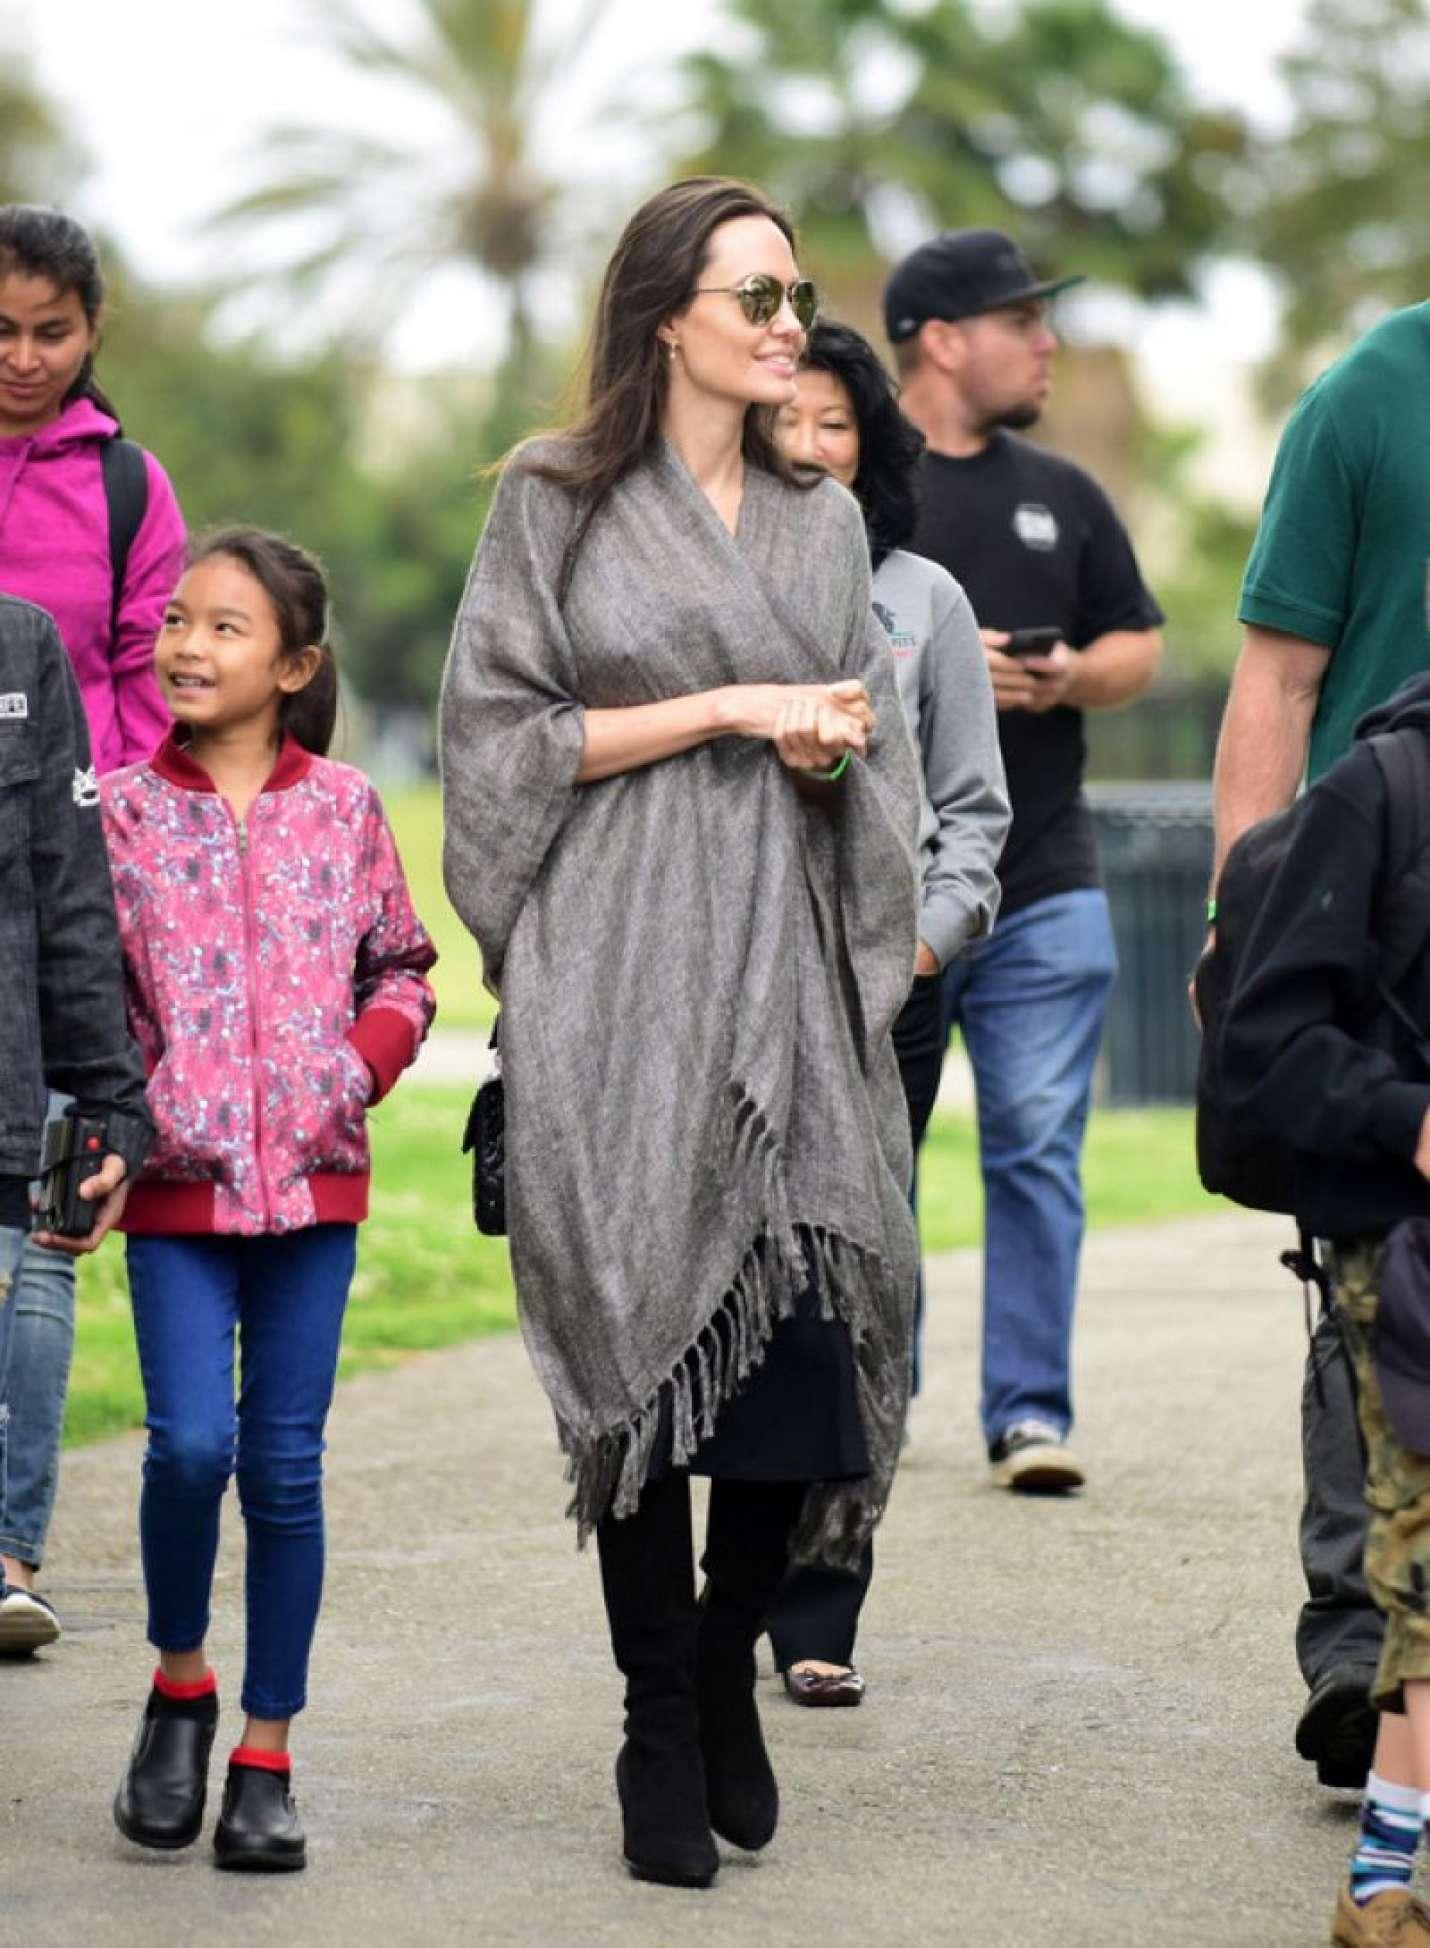 Angelina Jolie With Children at Disneyland Park in California